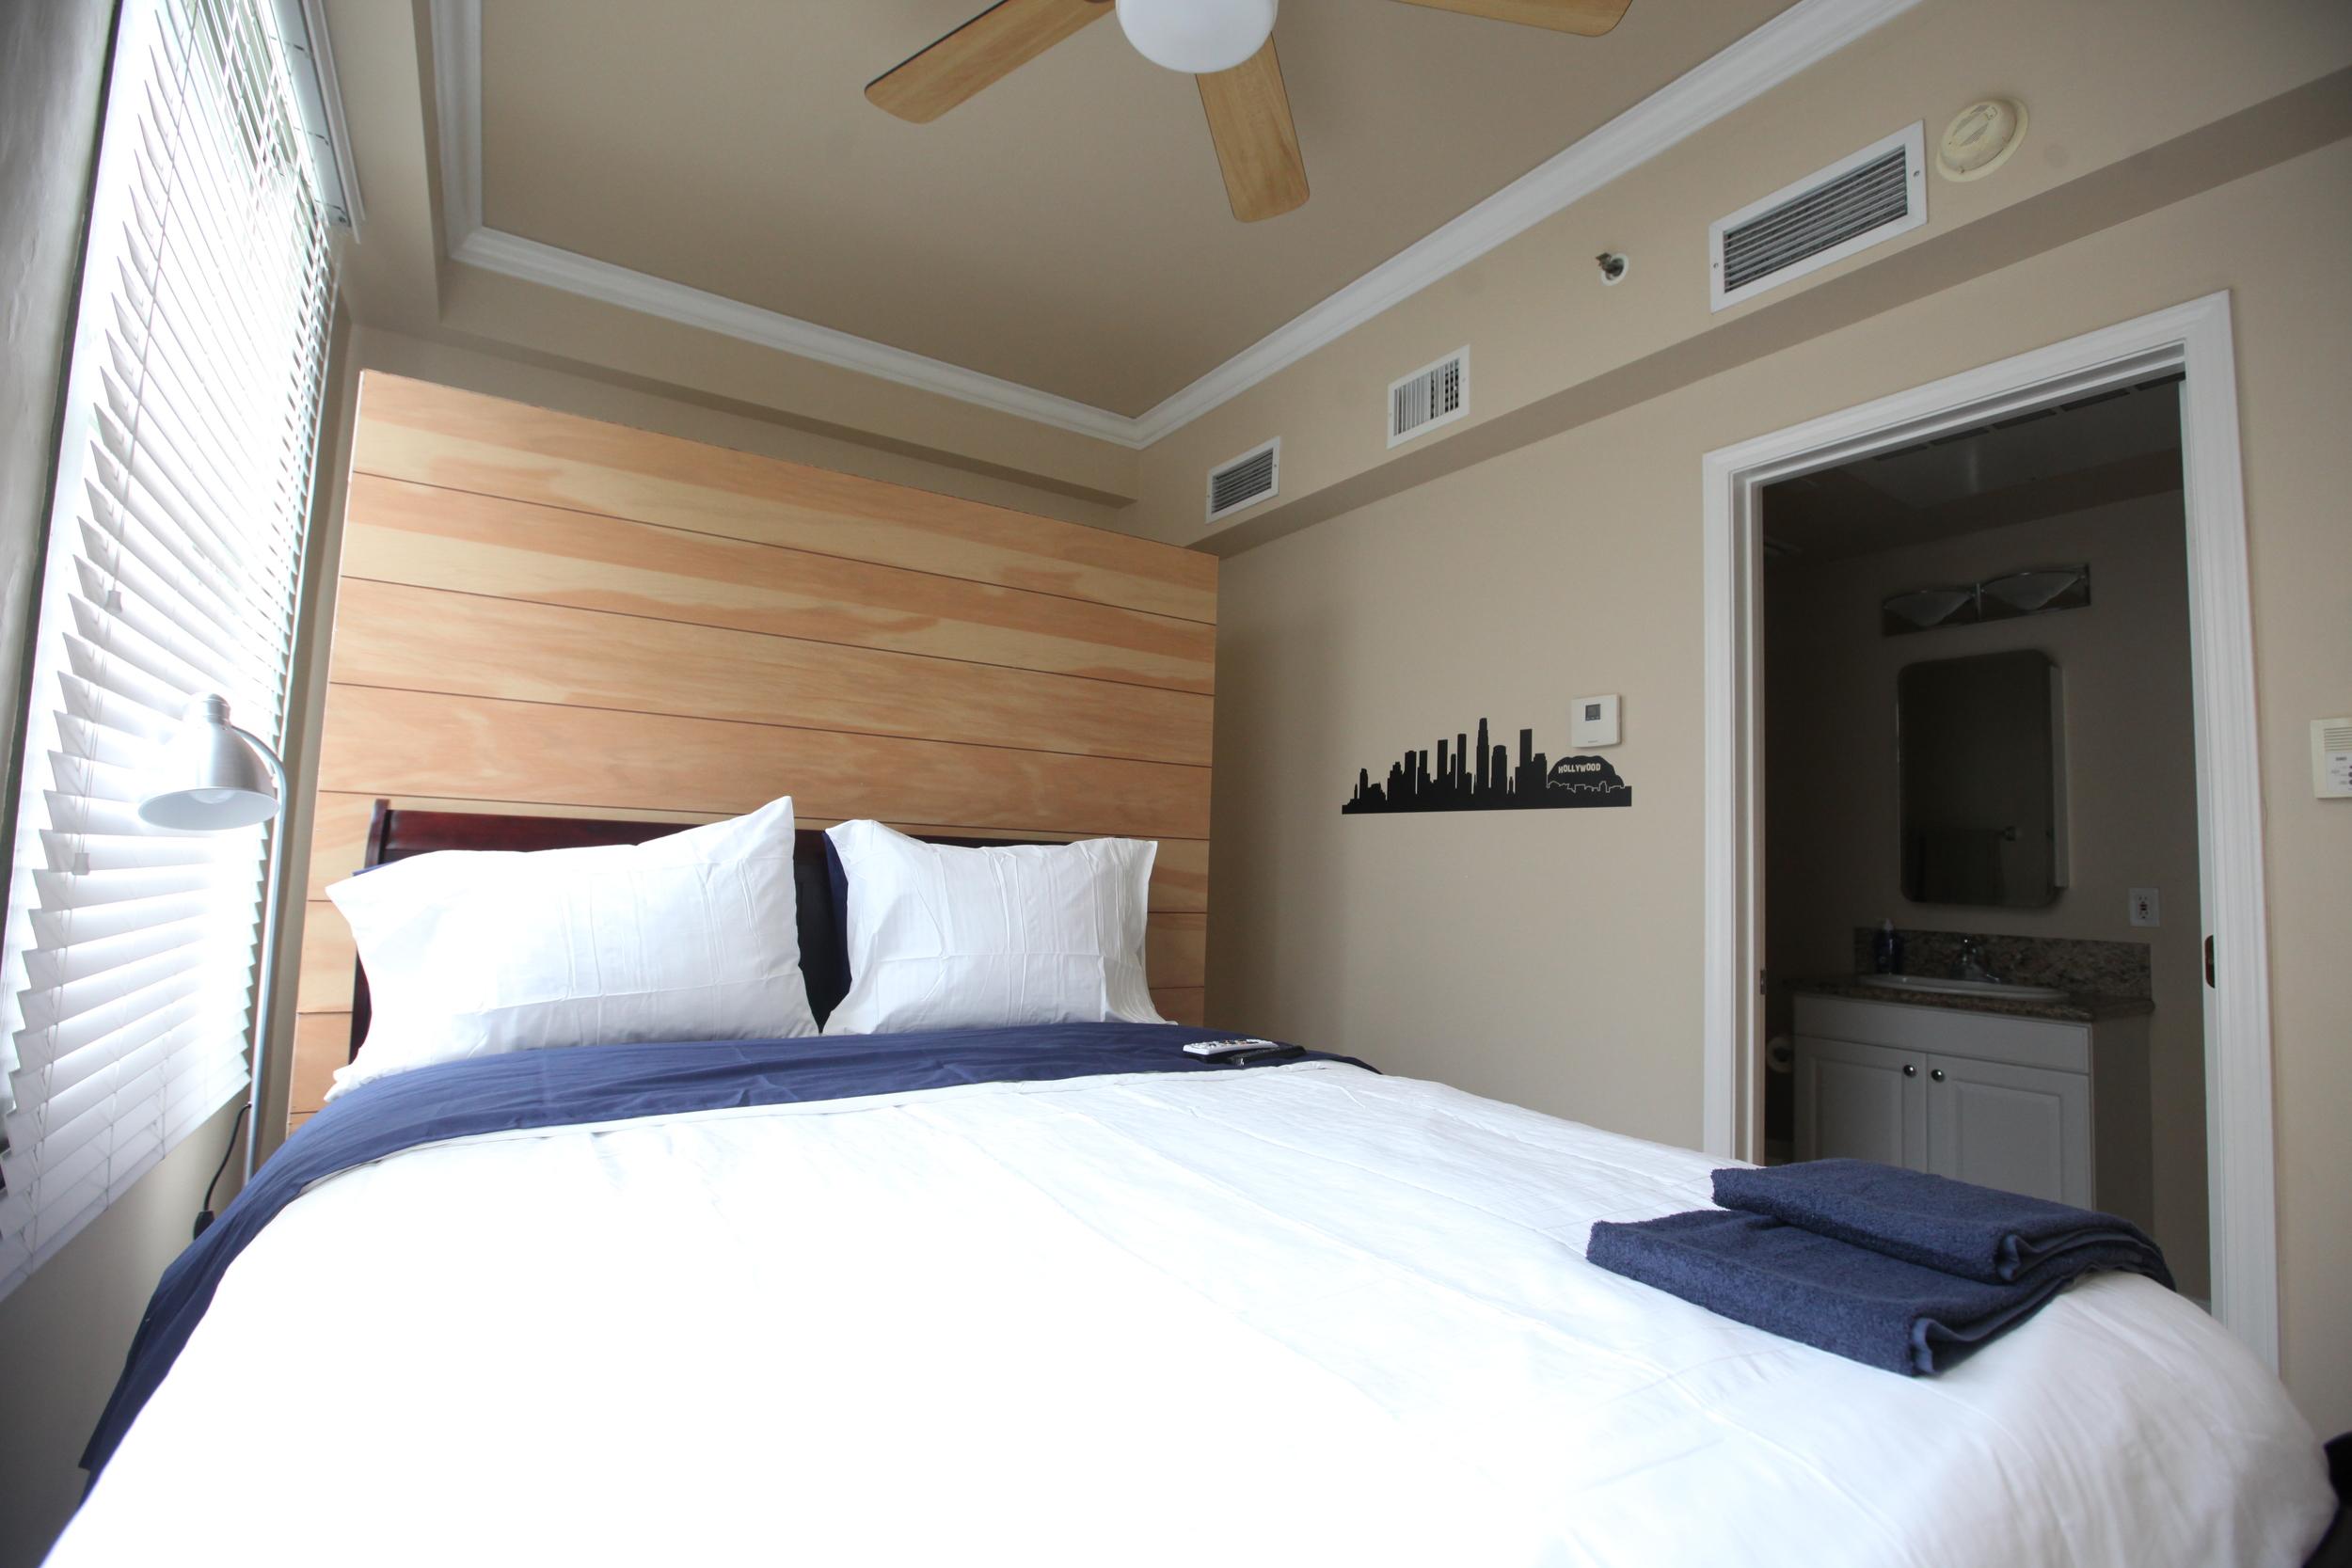 Unit 520 Bedroom